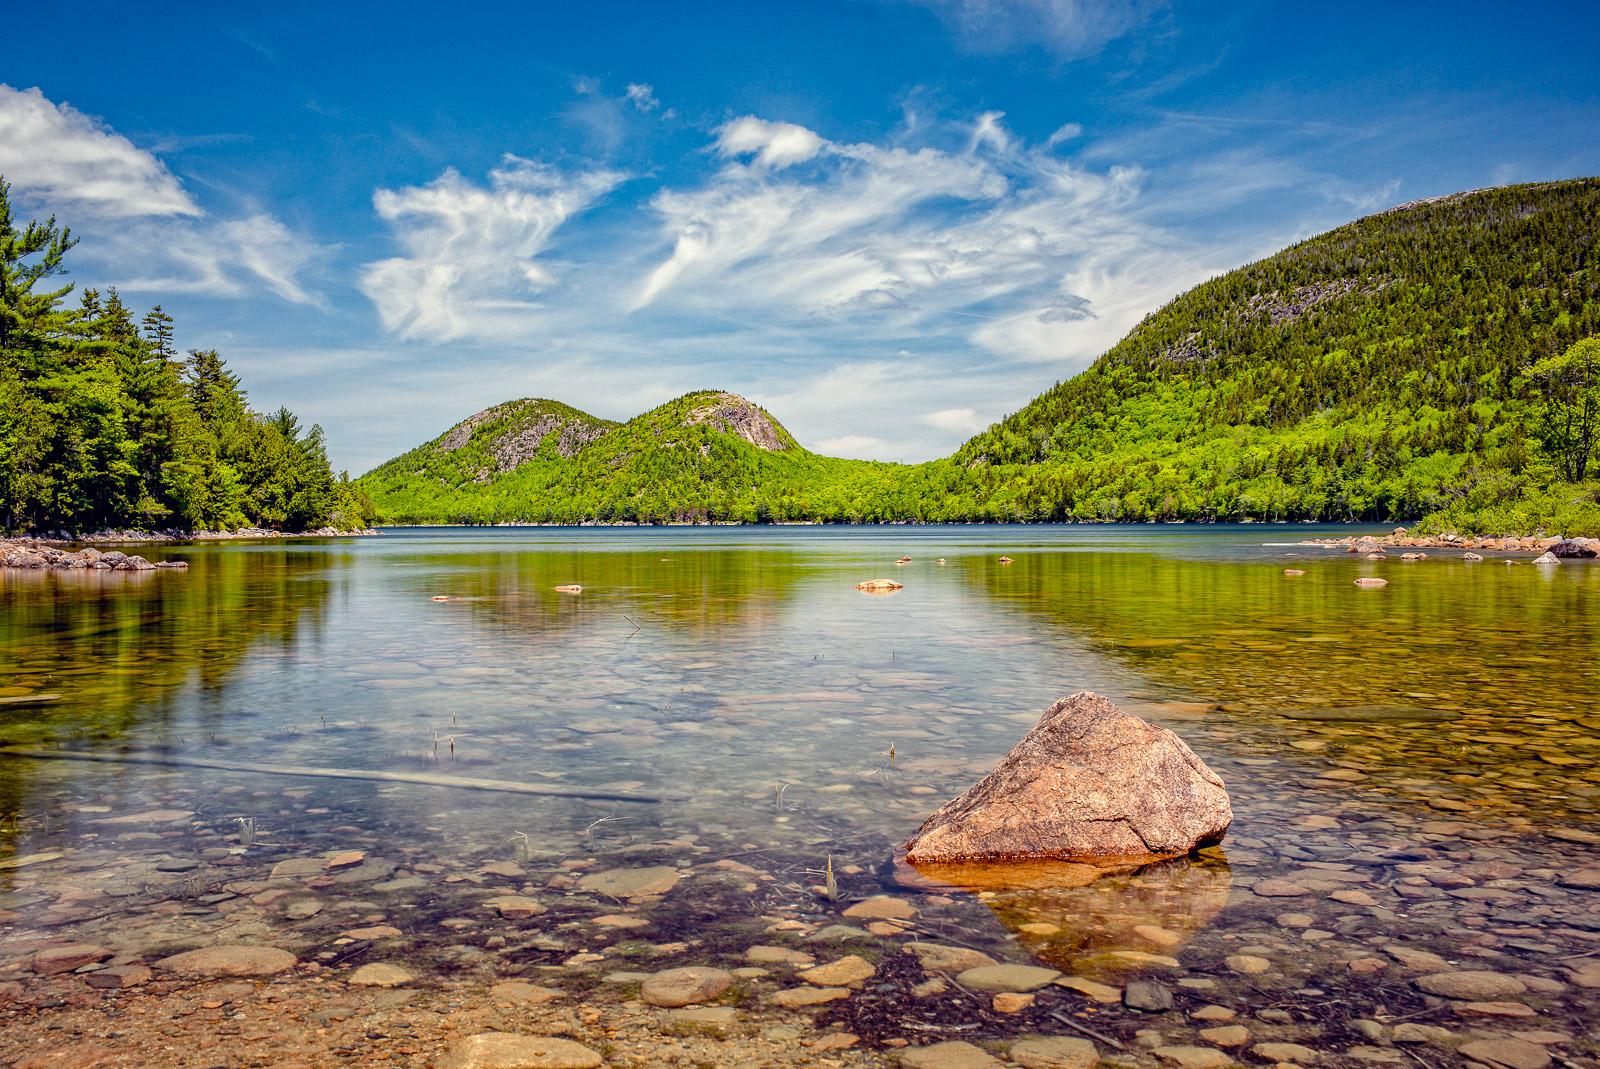 Acadia, Jordan Pond, New England, Scenic, landscape, calendar shot